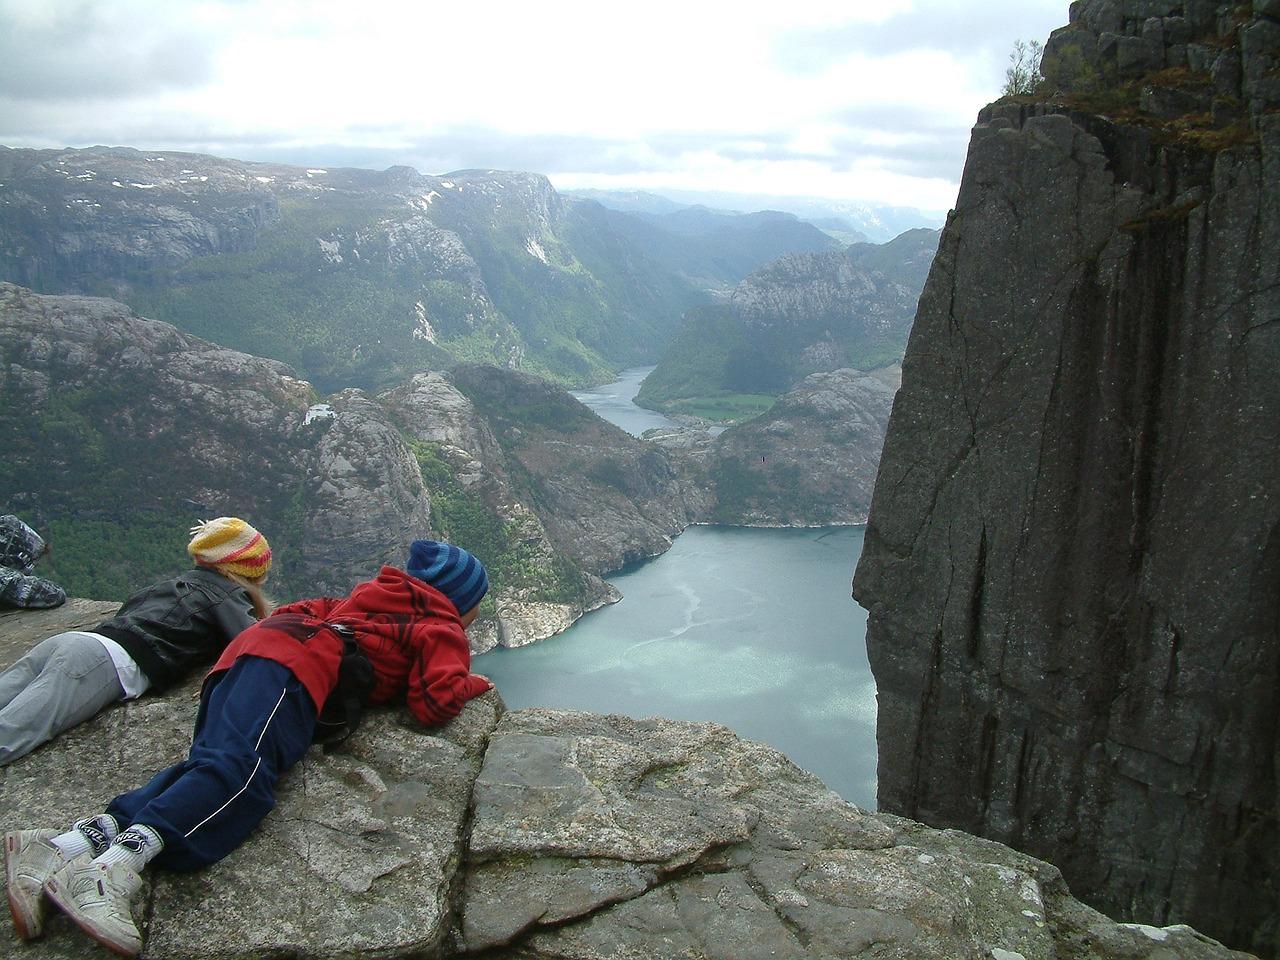 Прекестулен, Норвегия (Pulpit Rock, Norway)